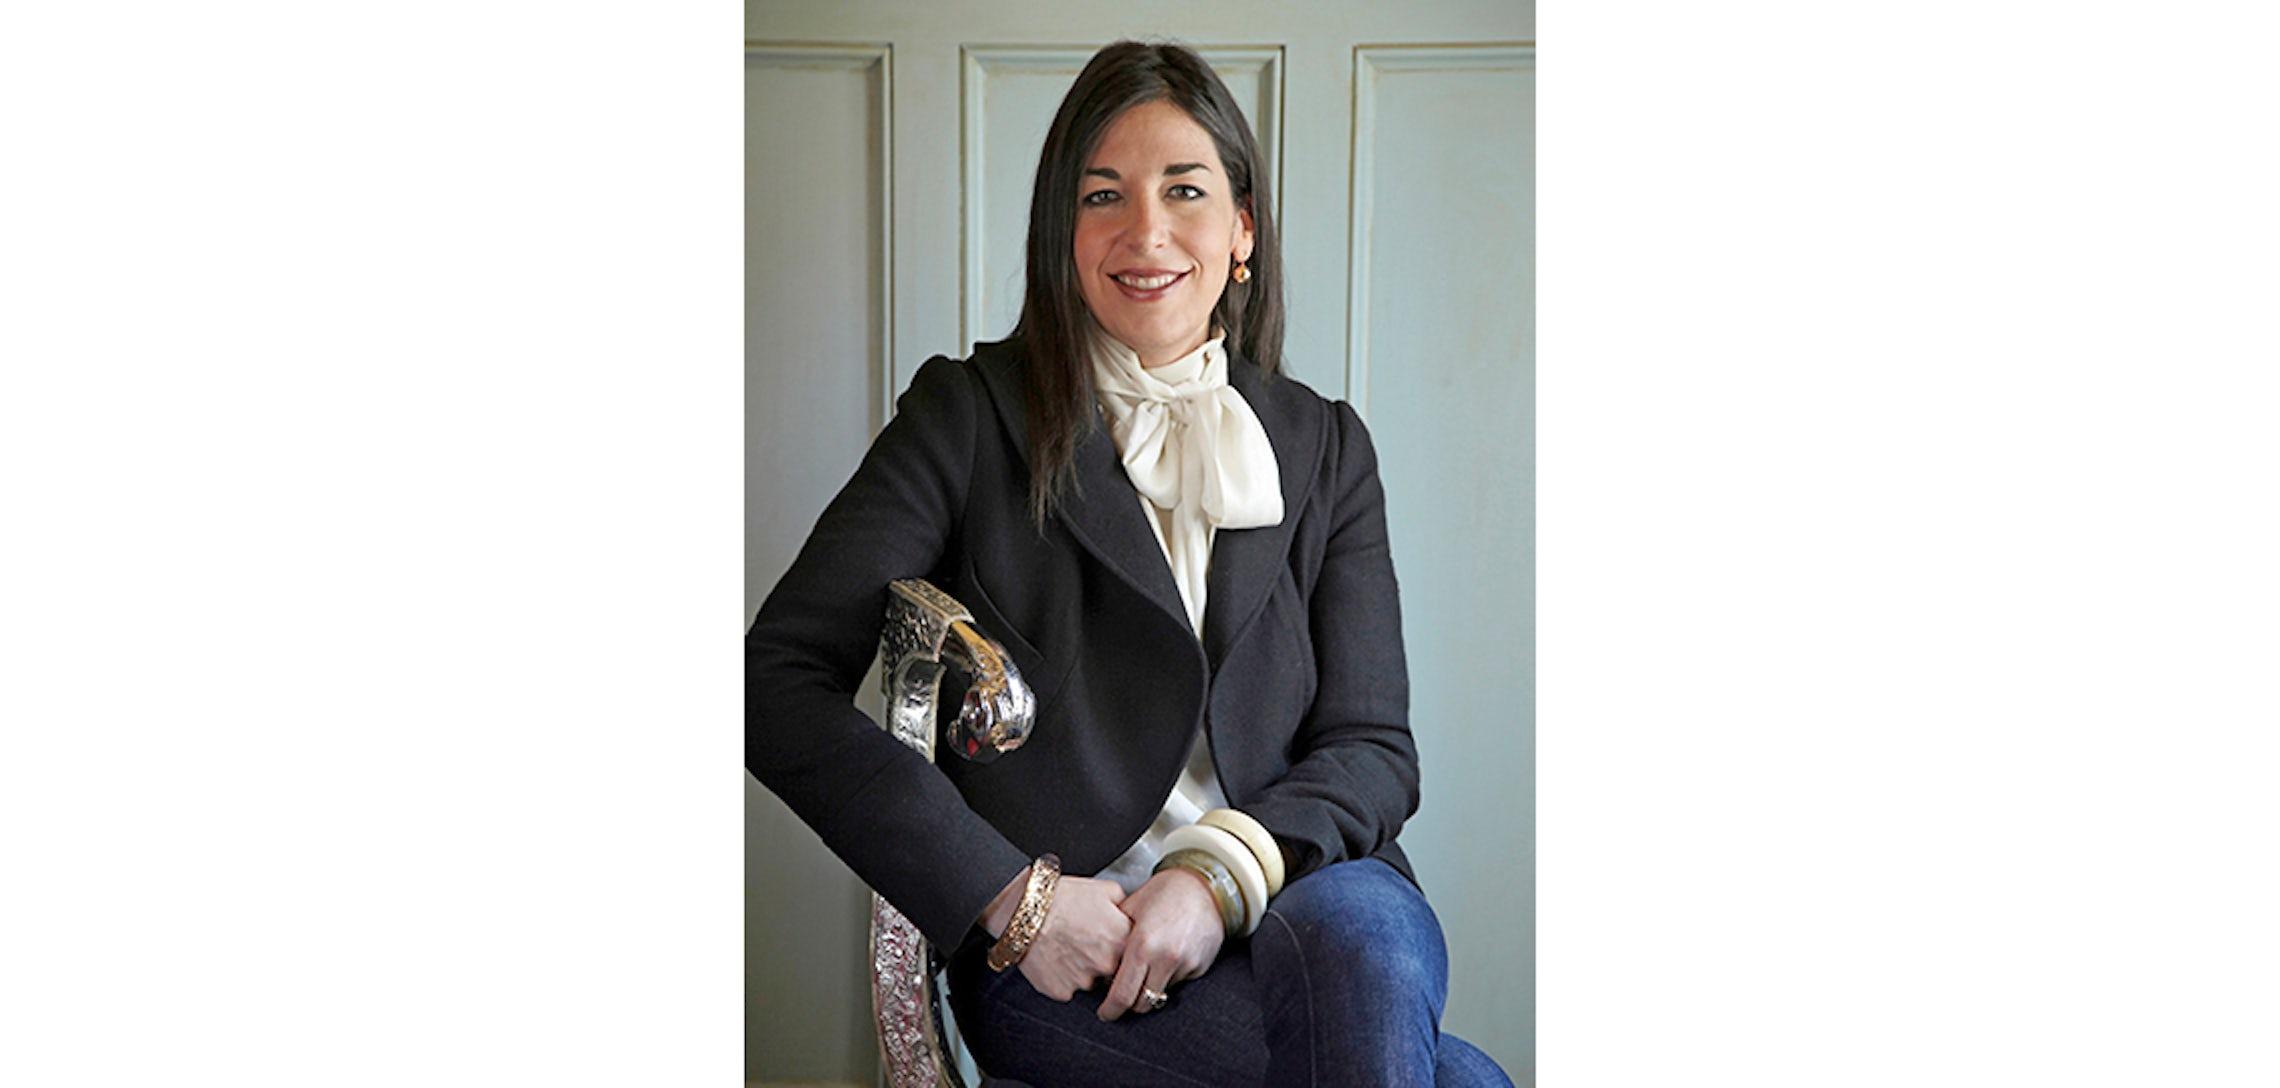 New York State Of Mind Baton Rouge Native And Home Decor Pr Pro Elizabeth Blitzer Inregister